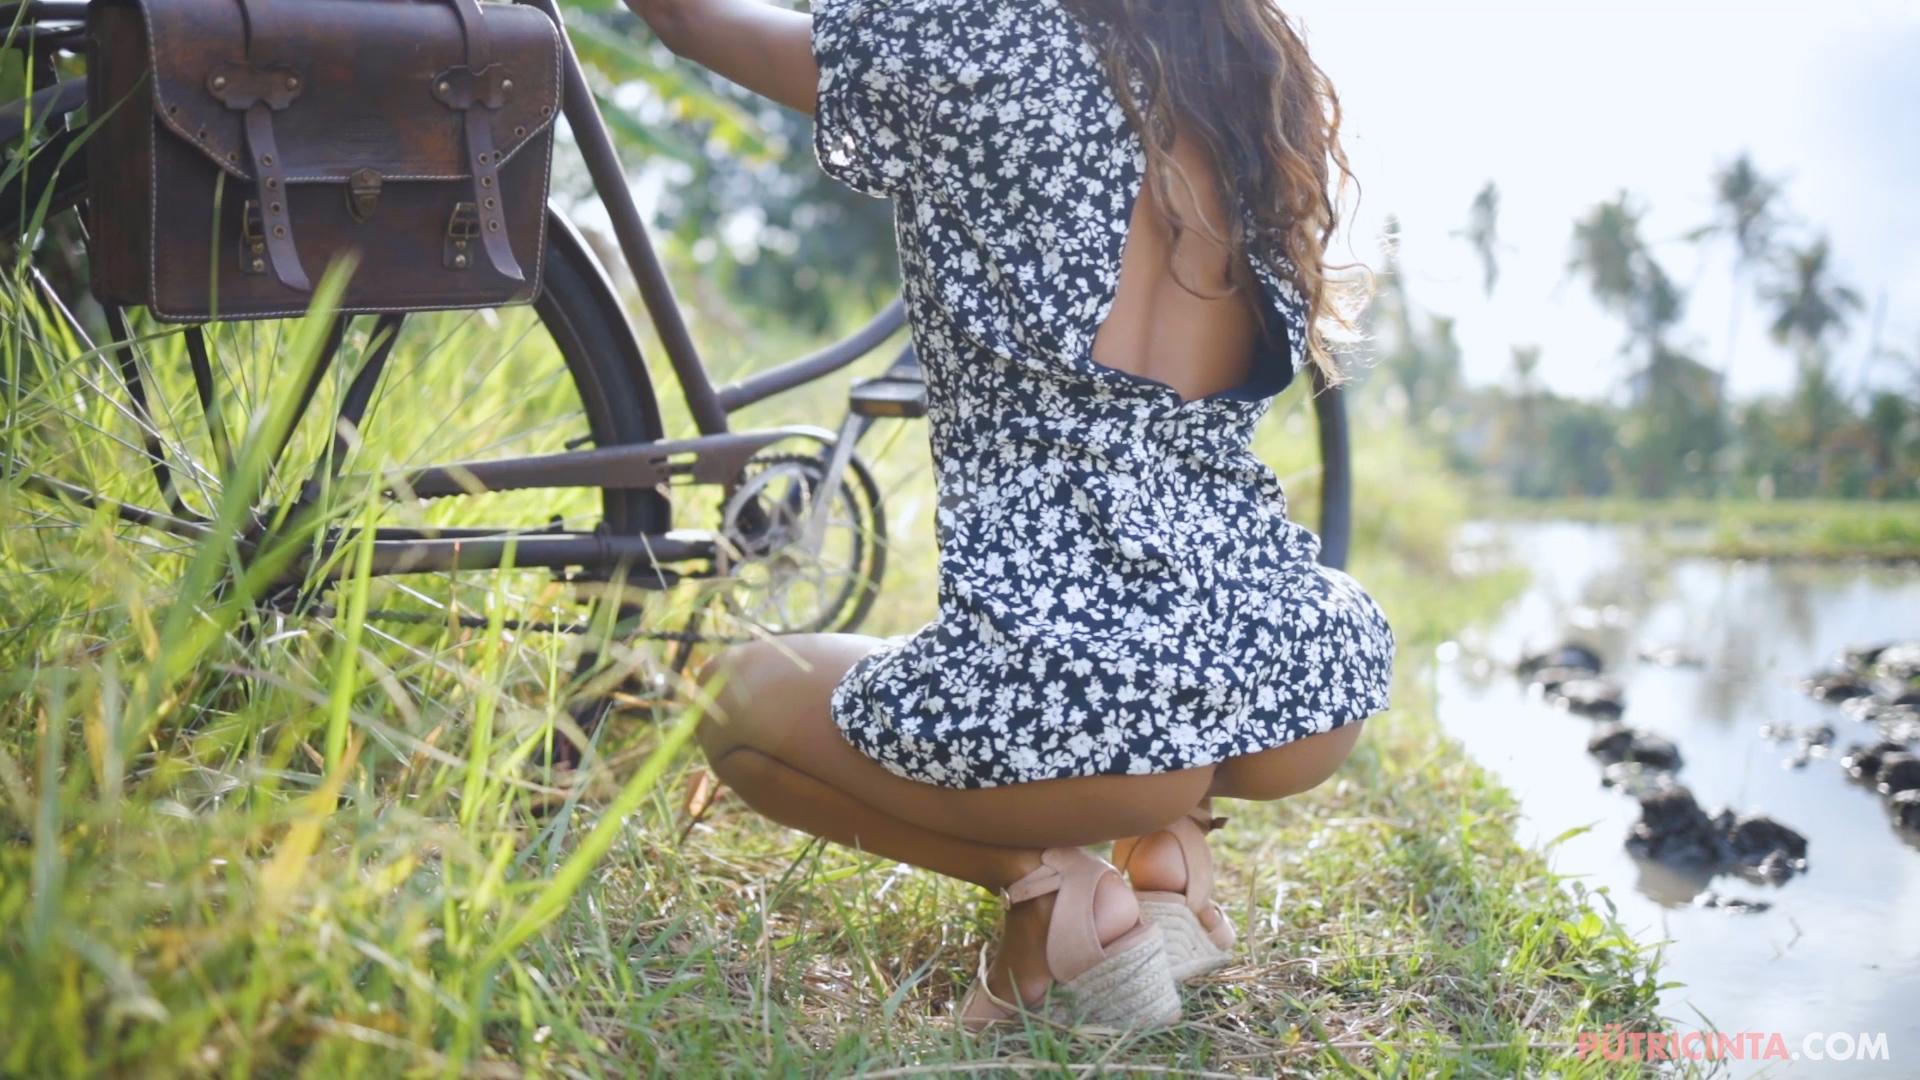 024-cyclingcommando-Putri-Cinta-teaser-stills-9.jpg